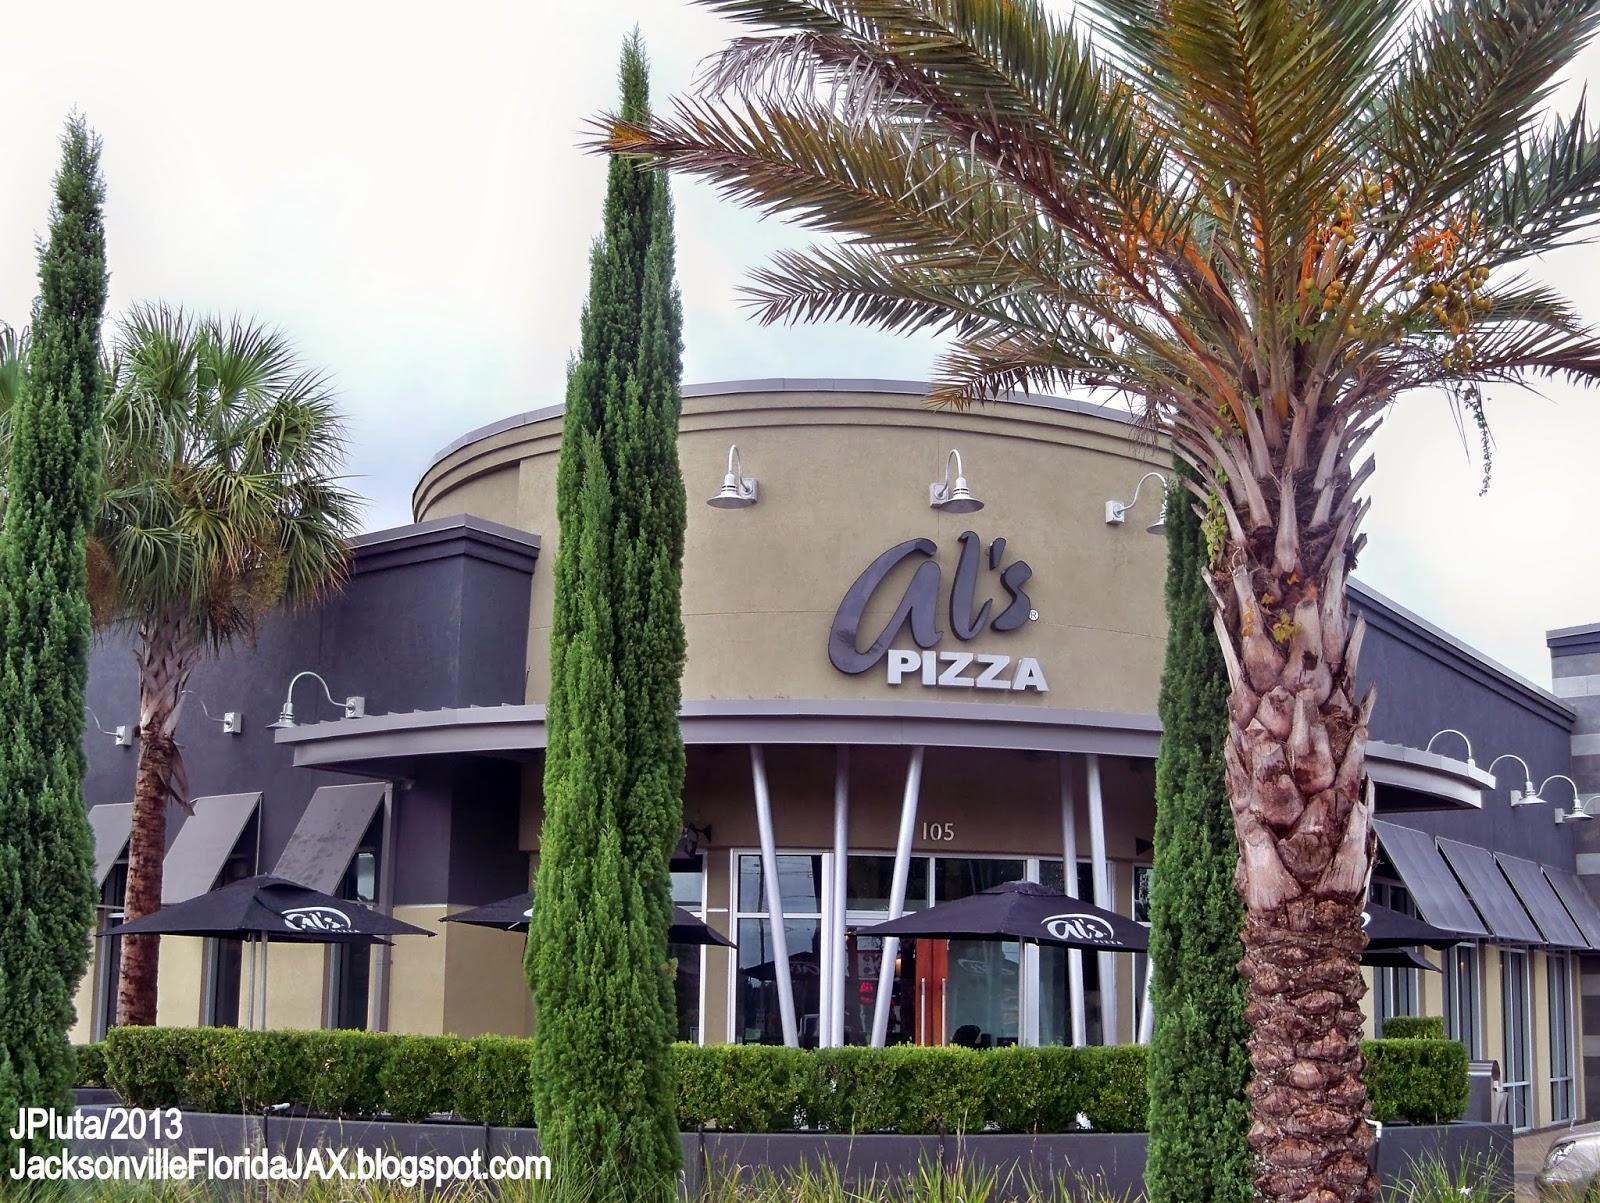 Al S Pizza Jacksonville Florida Phillips Hwy Restaurant Duval County Jax Fl